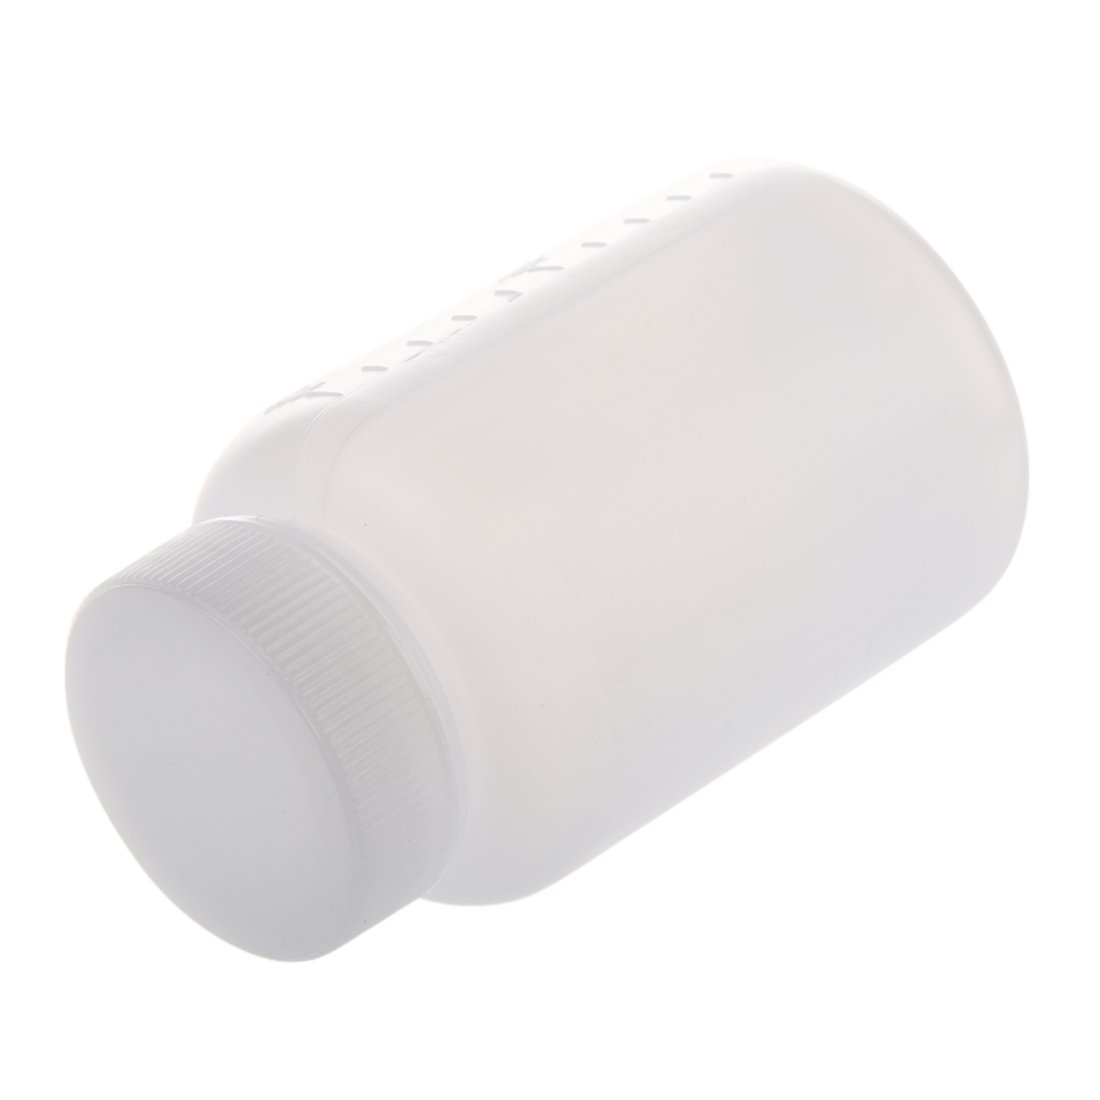 100 pcs Laboratory Storage Case White Plastic Bottle 100mL by AIBOAT